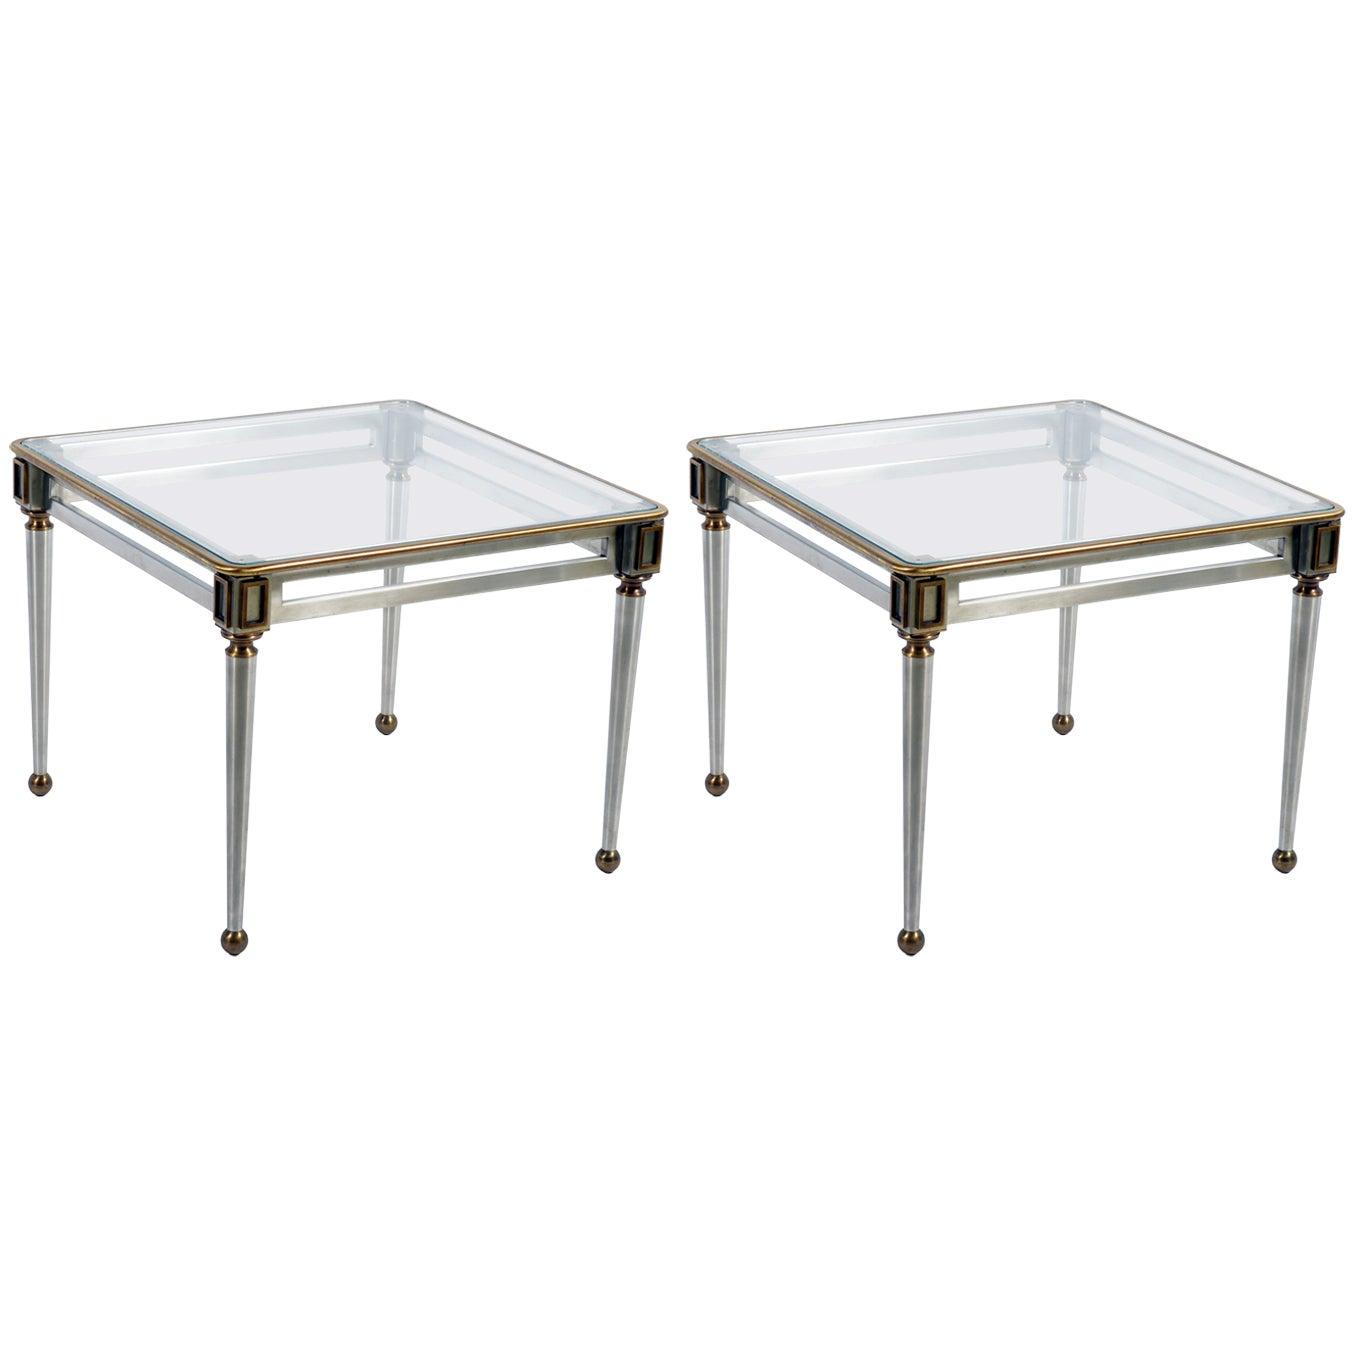 Banci Firenze Midcentury Italian Pair Steel Brass Side Tables Nightstand, 1960s